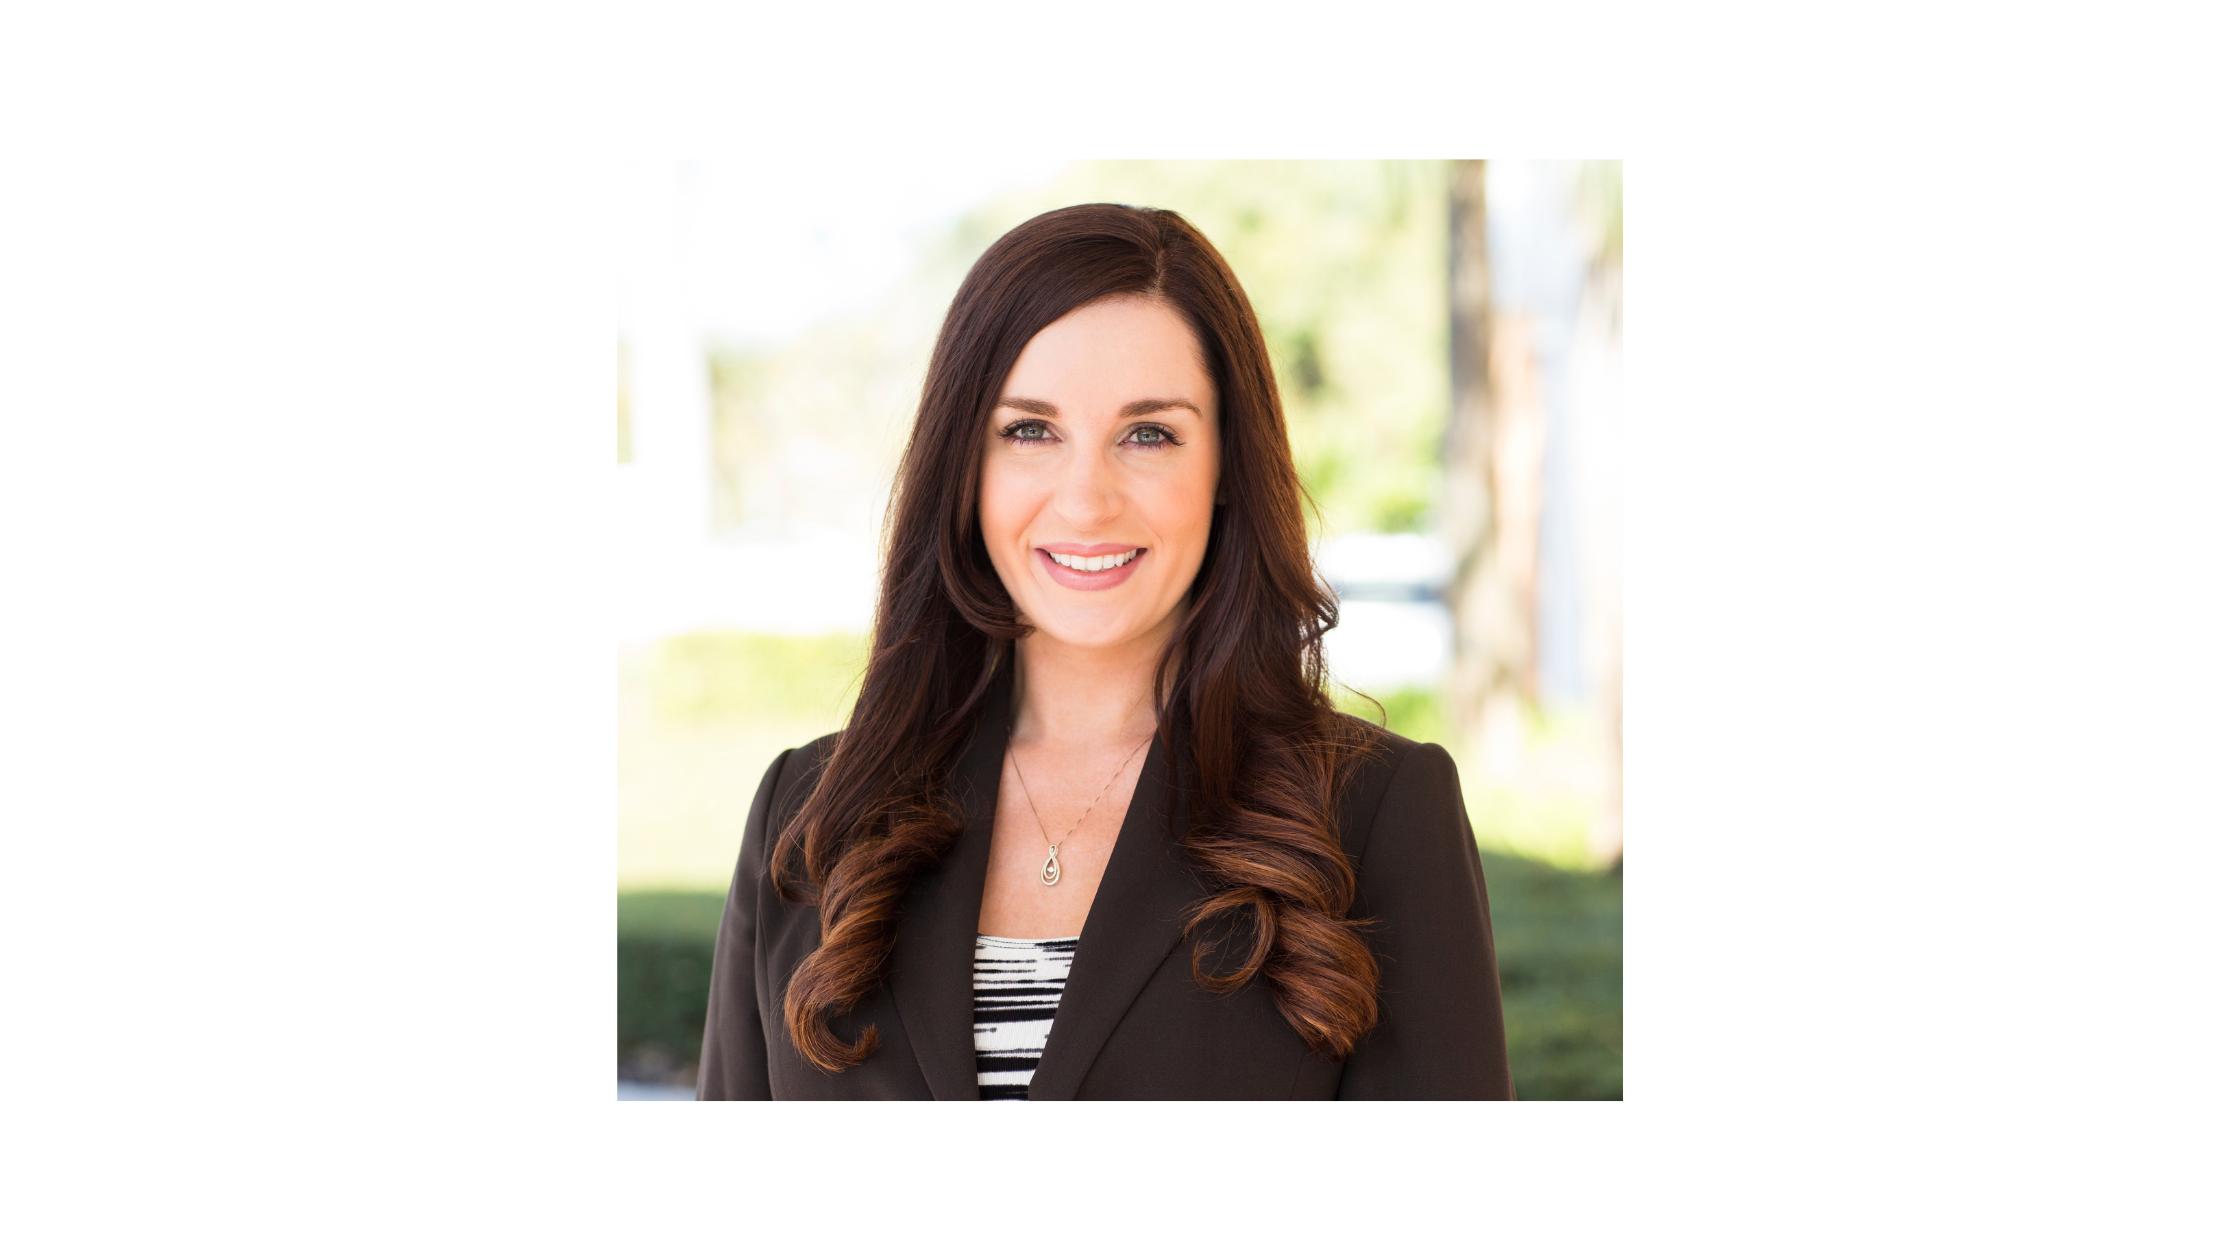 CONRIC pr + marketing promotes Jaimie Miller to Senior Vice President